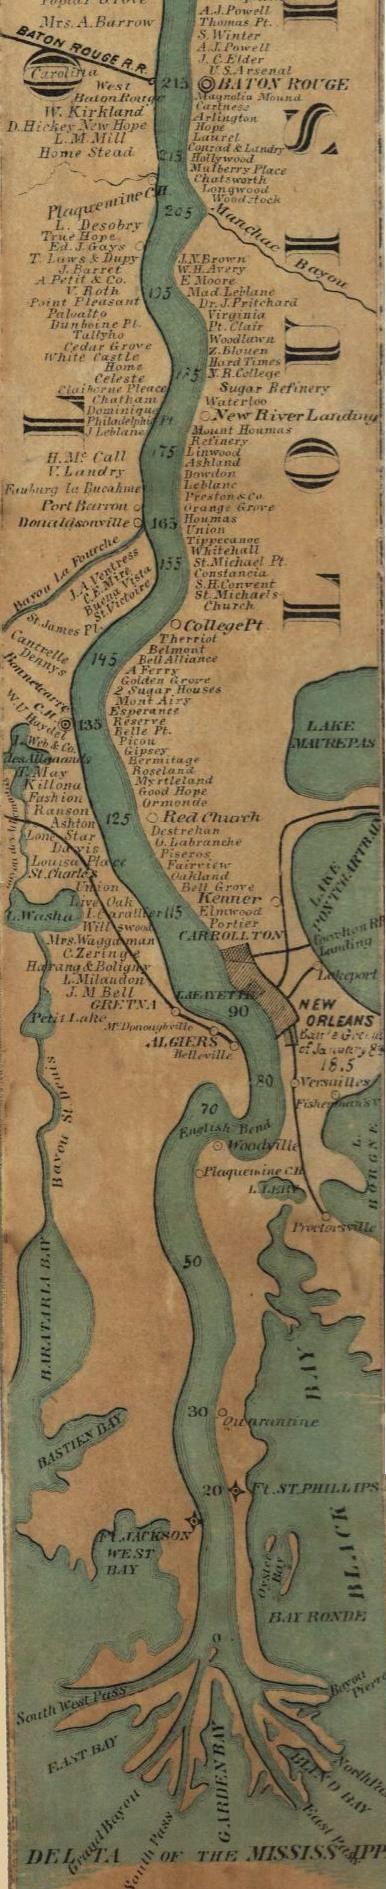 Mississippi River map.